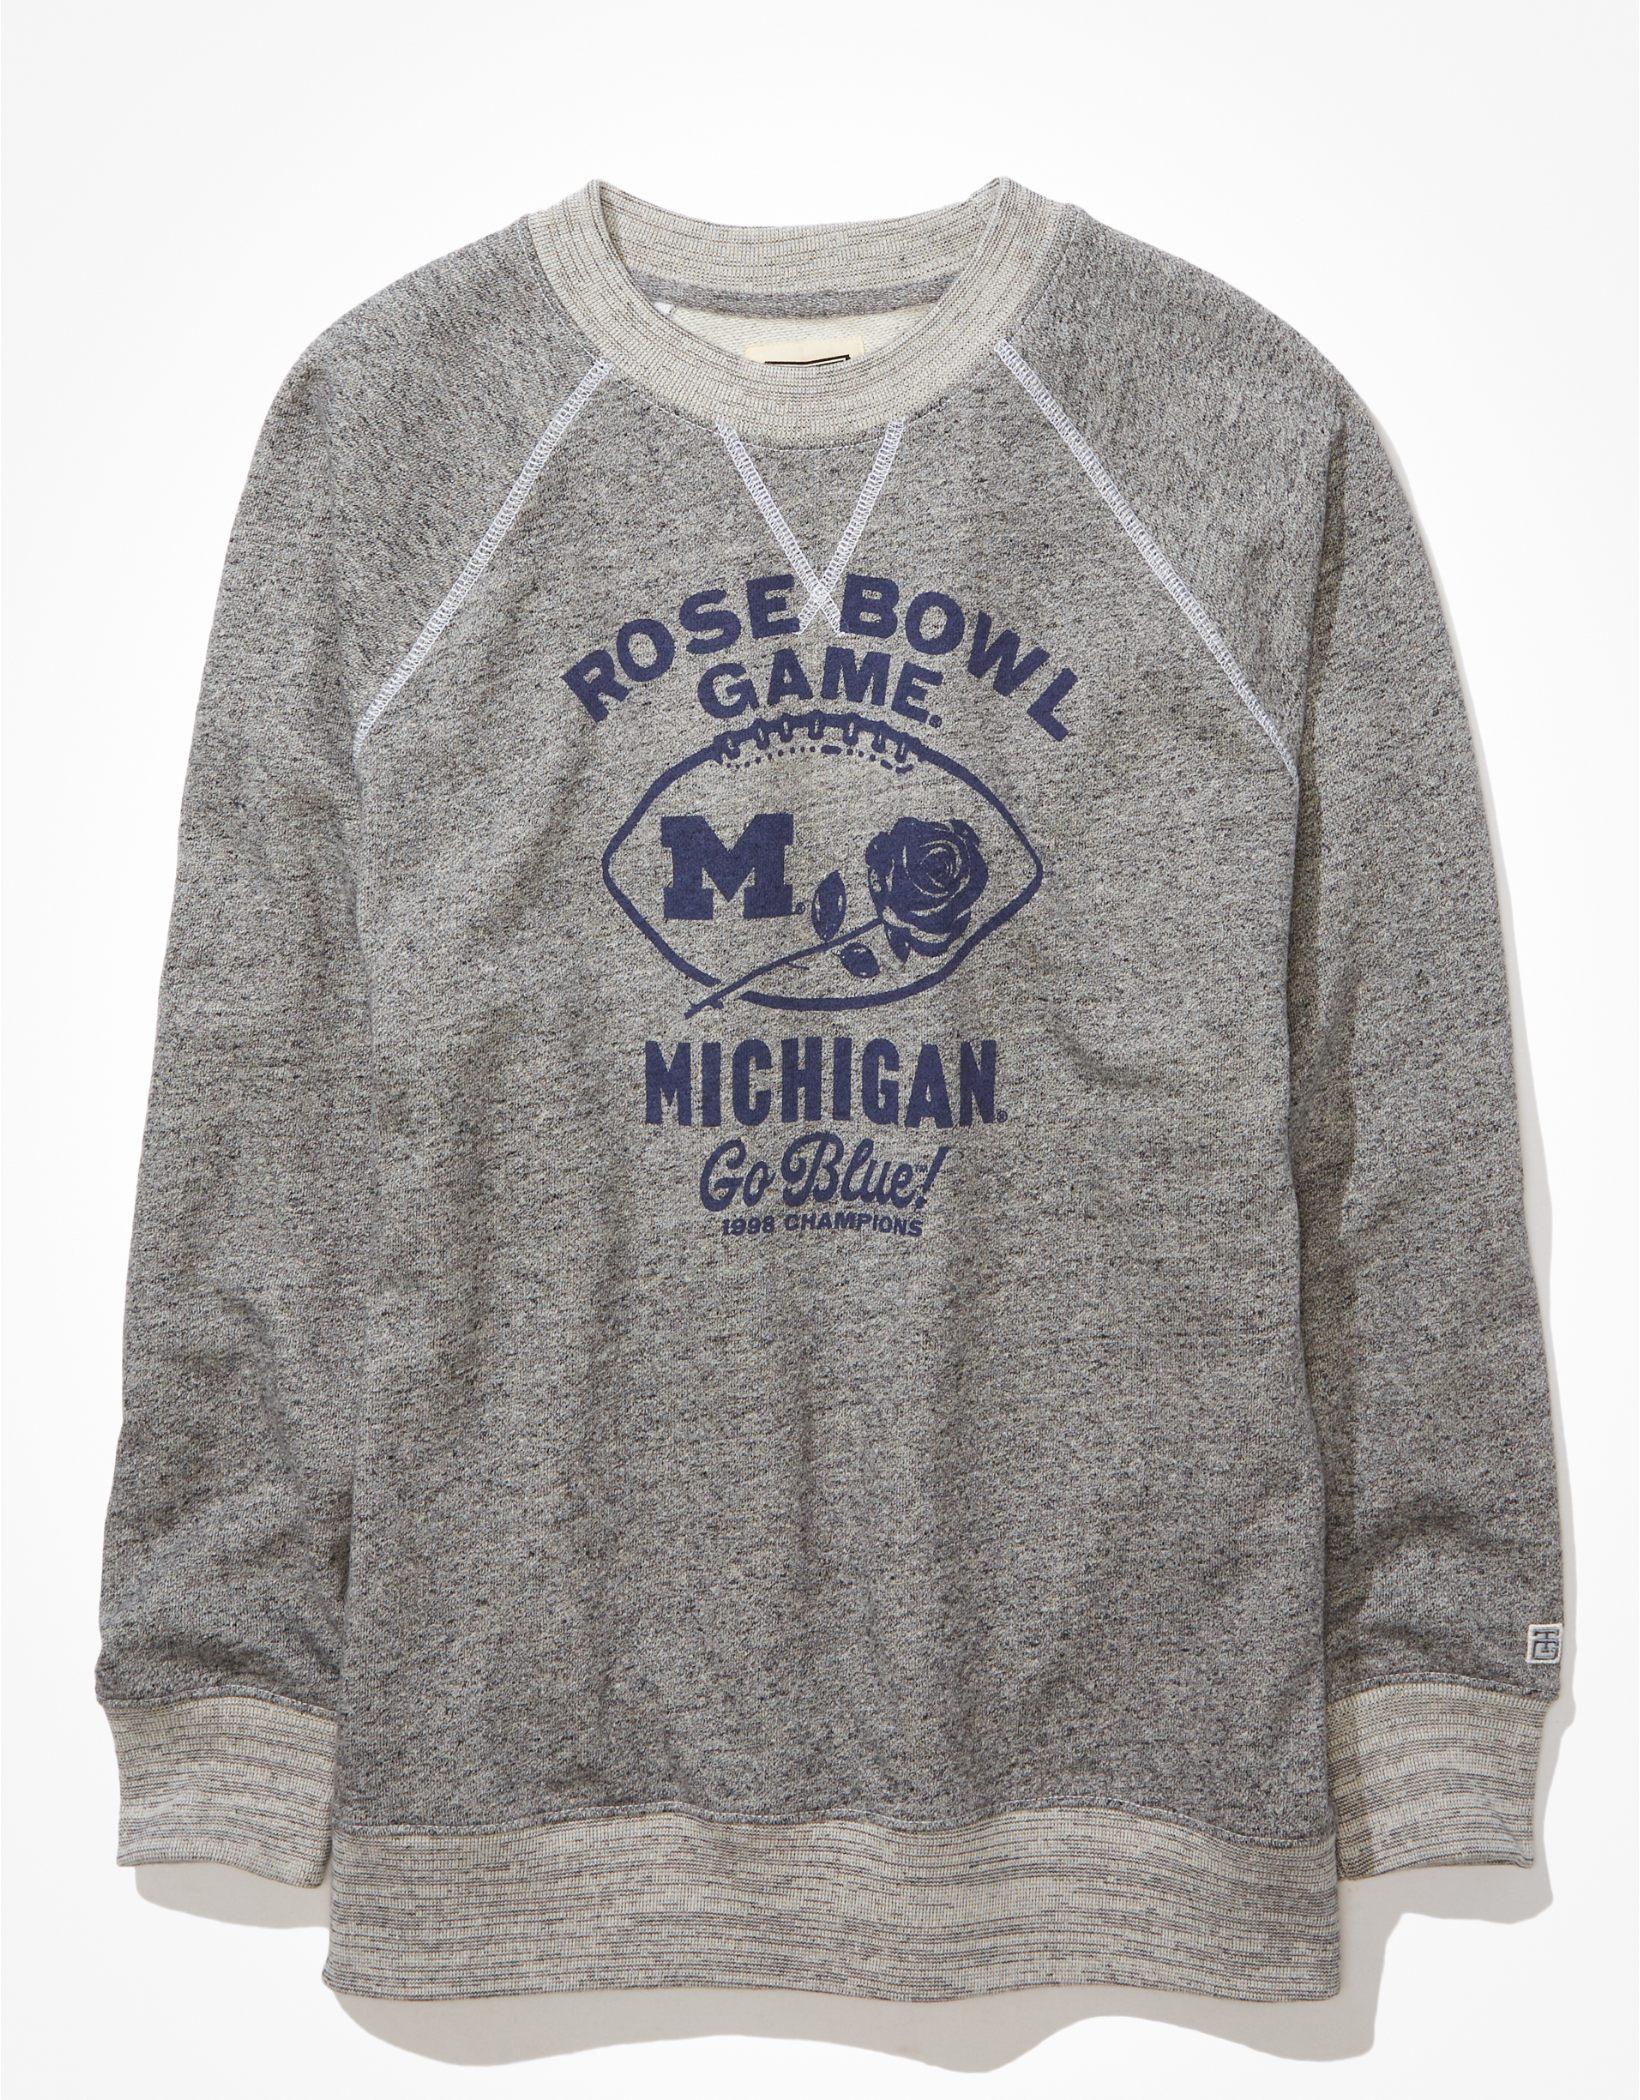 Tailgate Women's Michigan Wolverines Oversized Fleece Sweatshirt